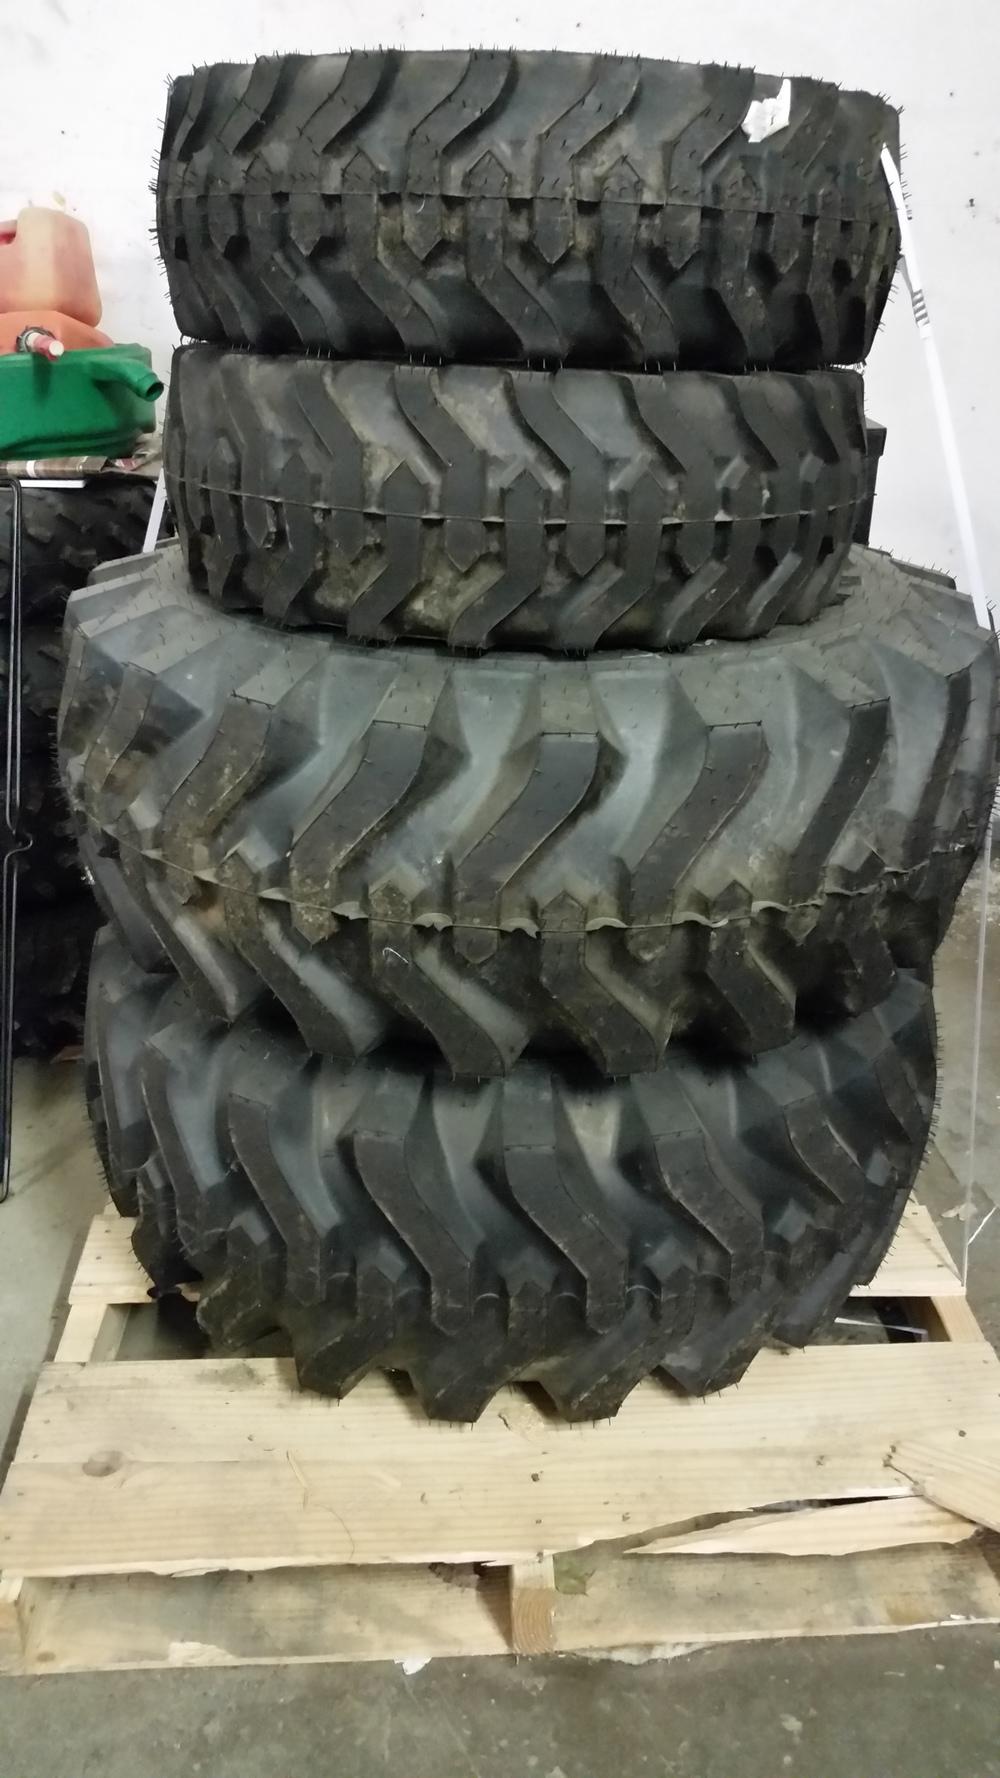 Tires 27x8.50-15 & 15x19.5